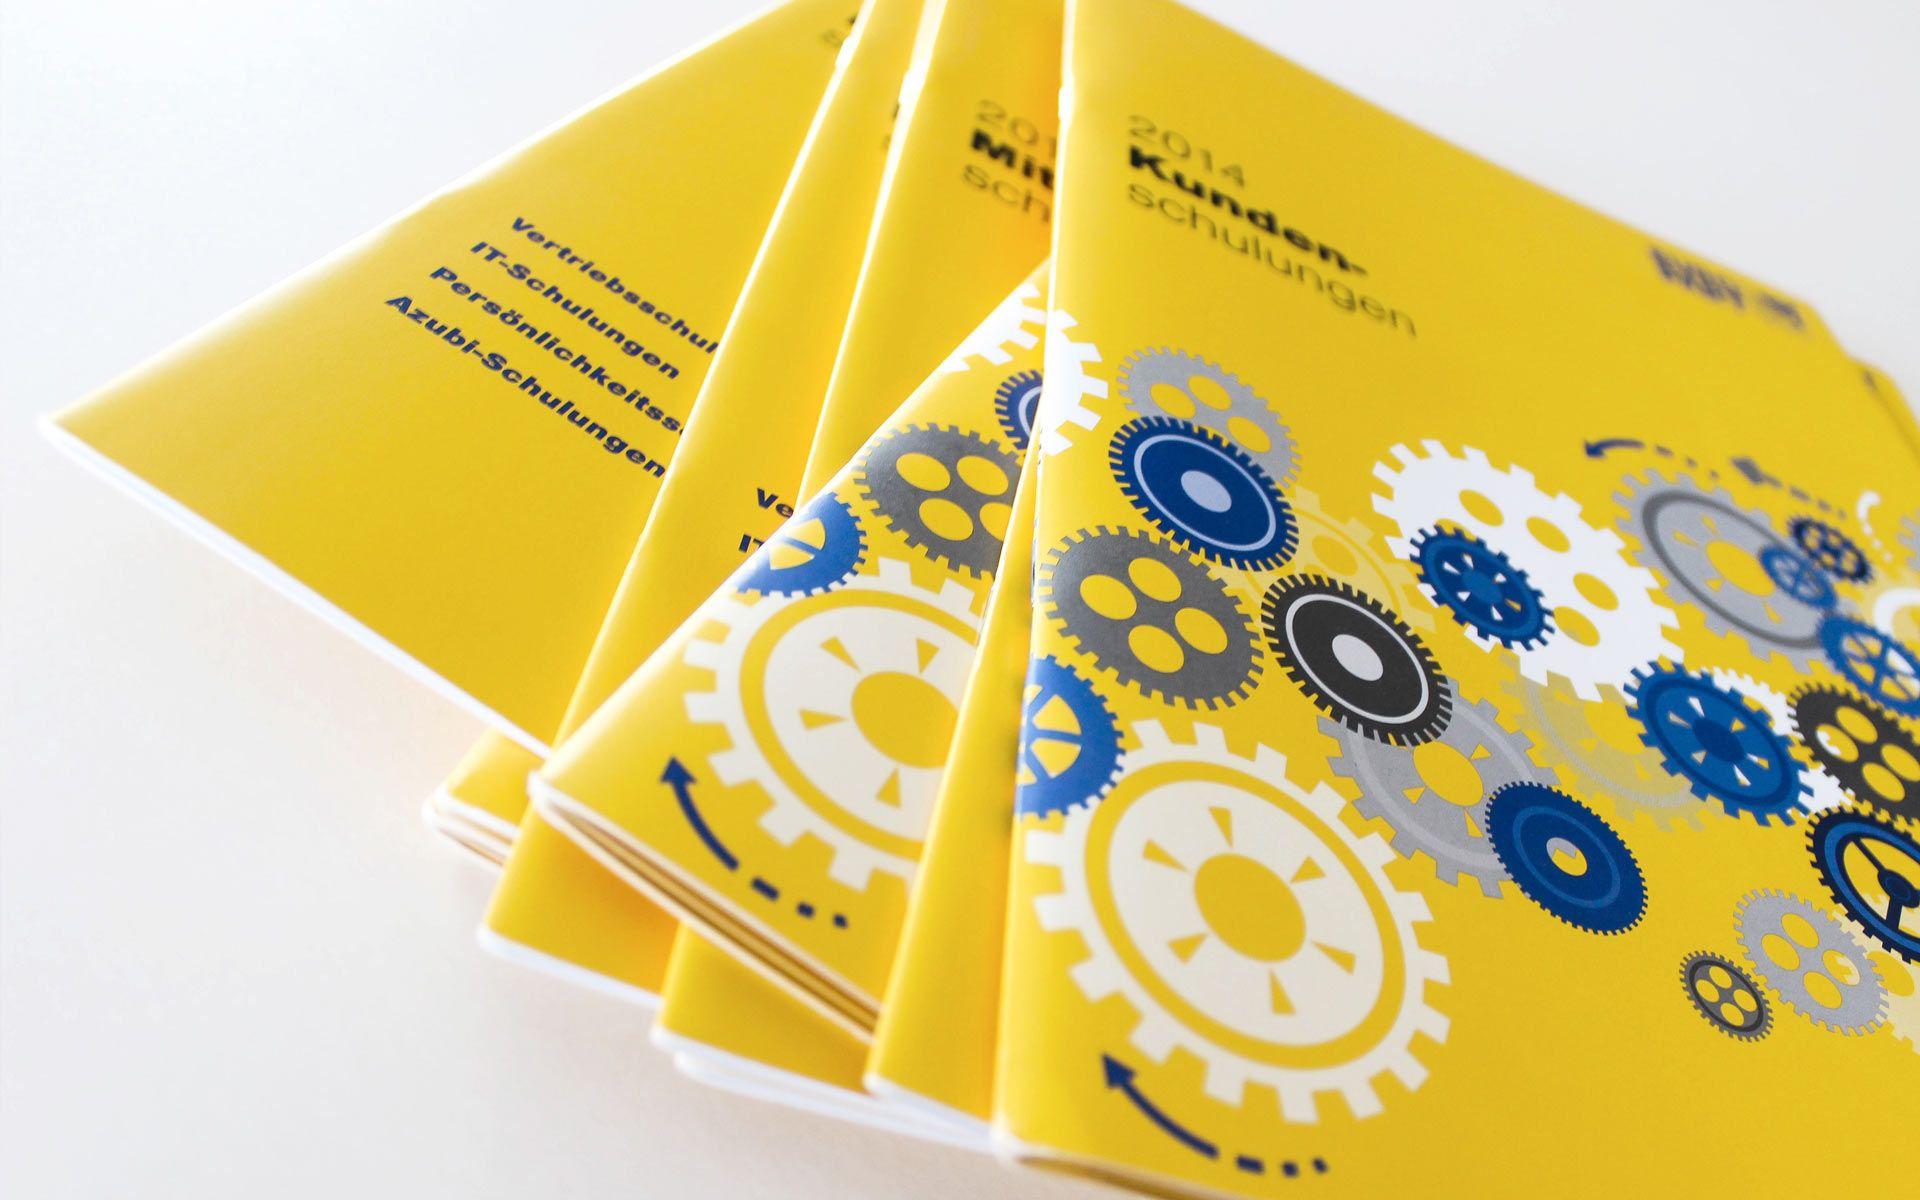 Broschürengestaltung: EUROPART Schulungshefte